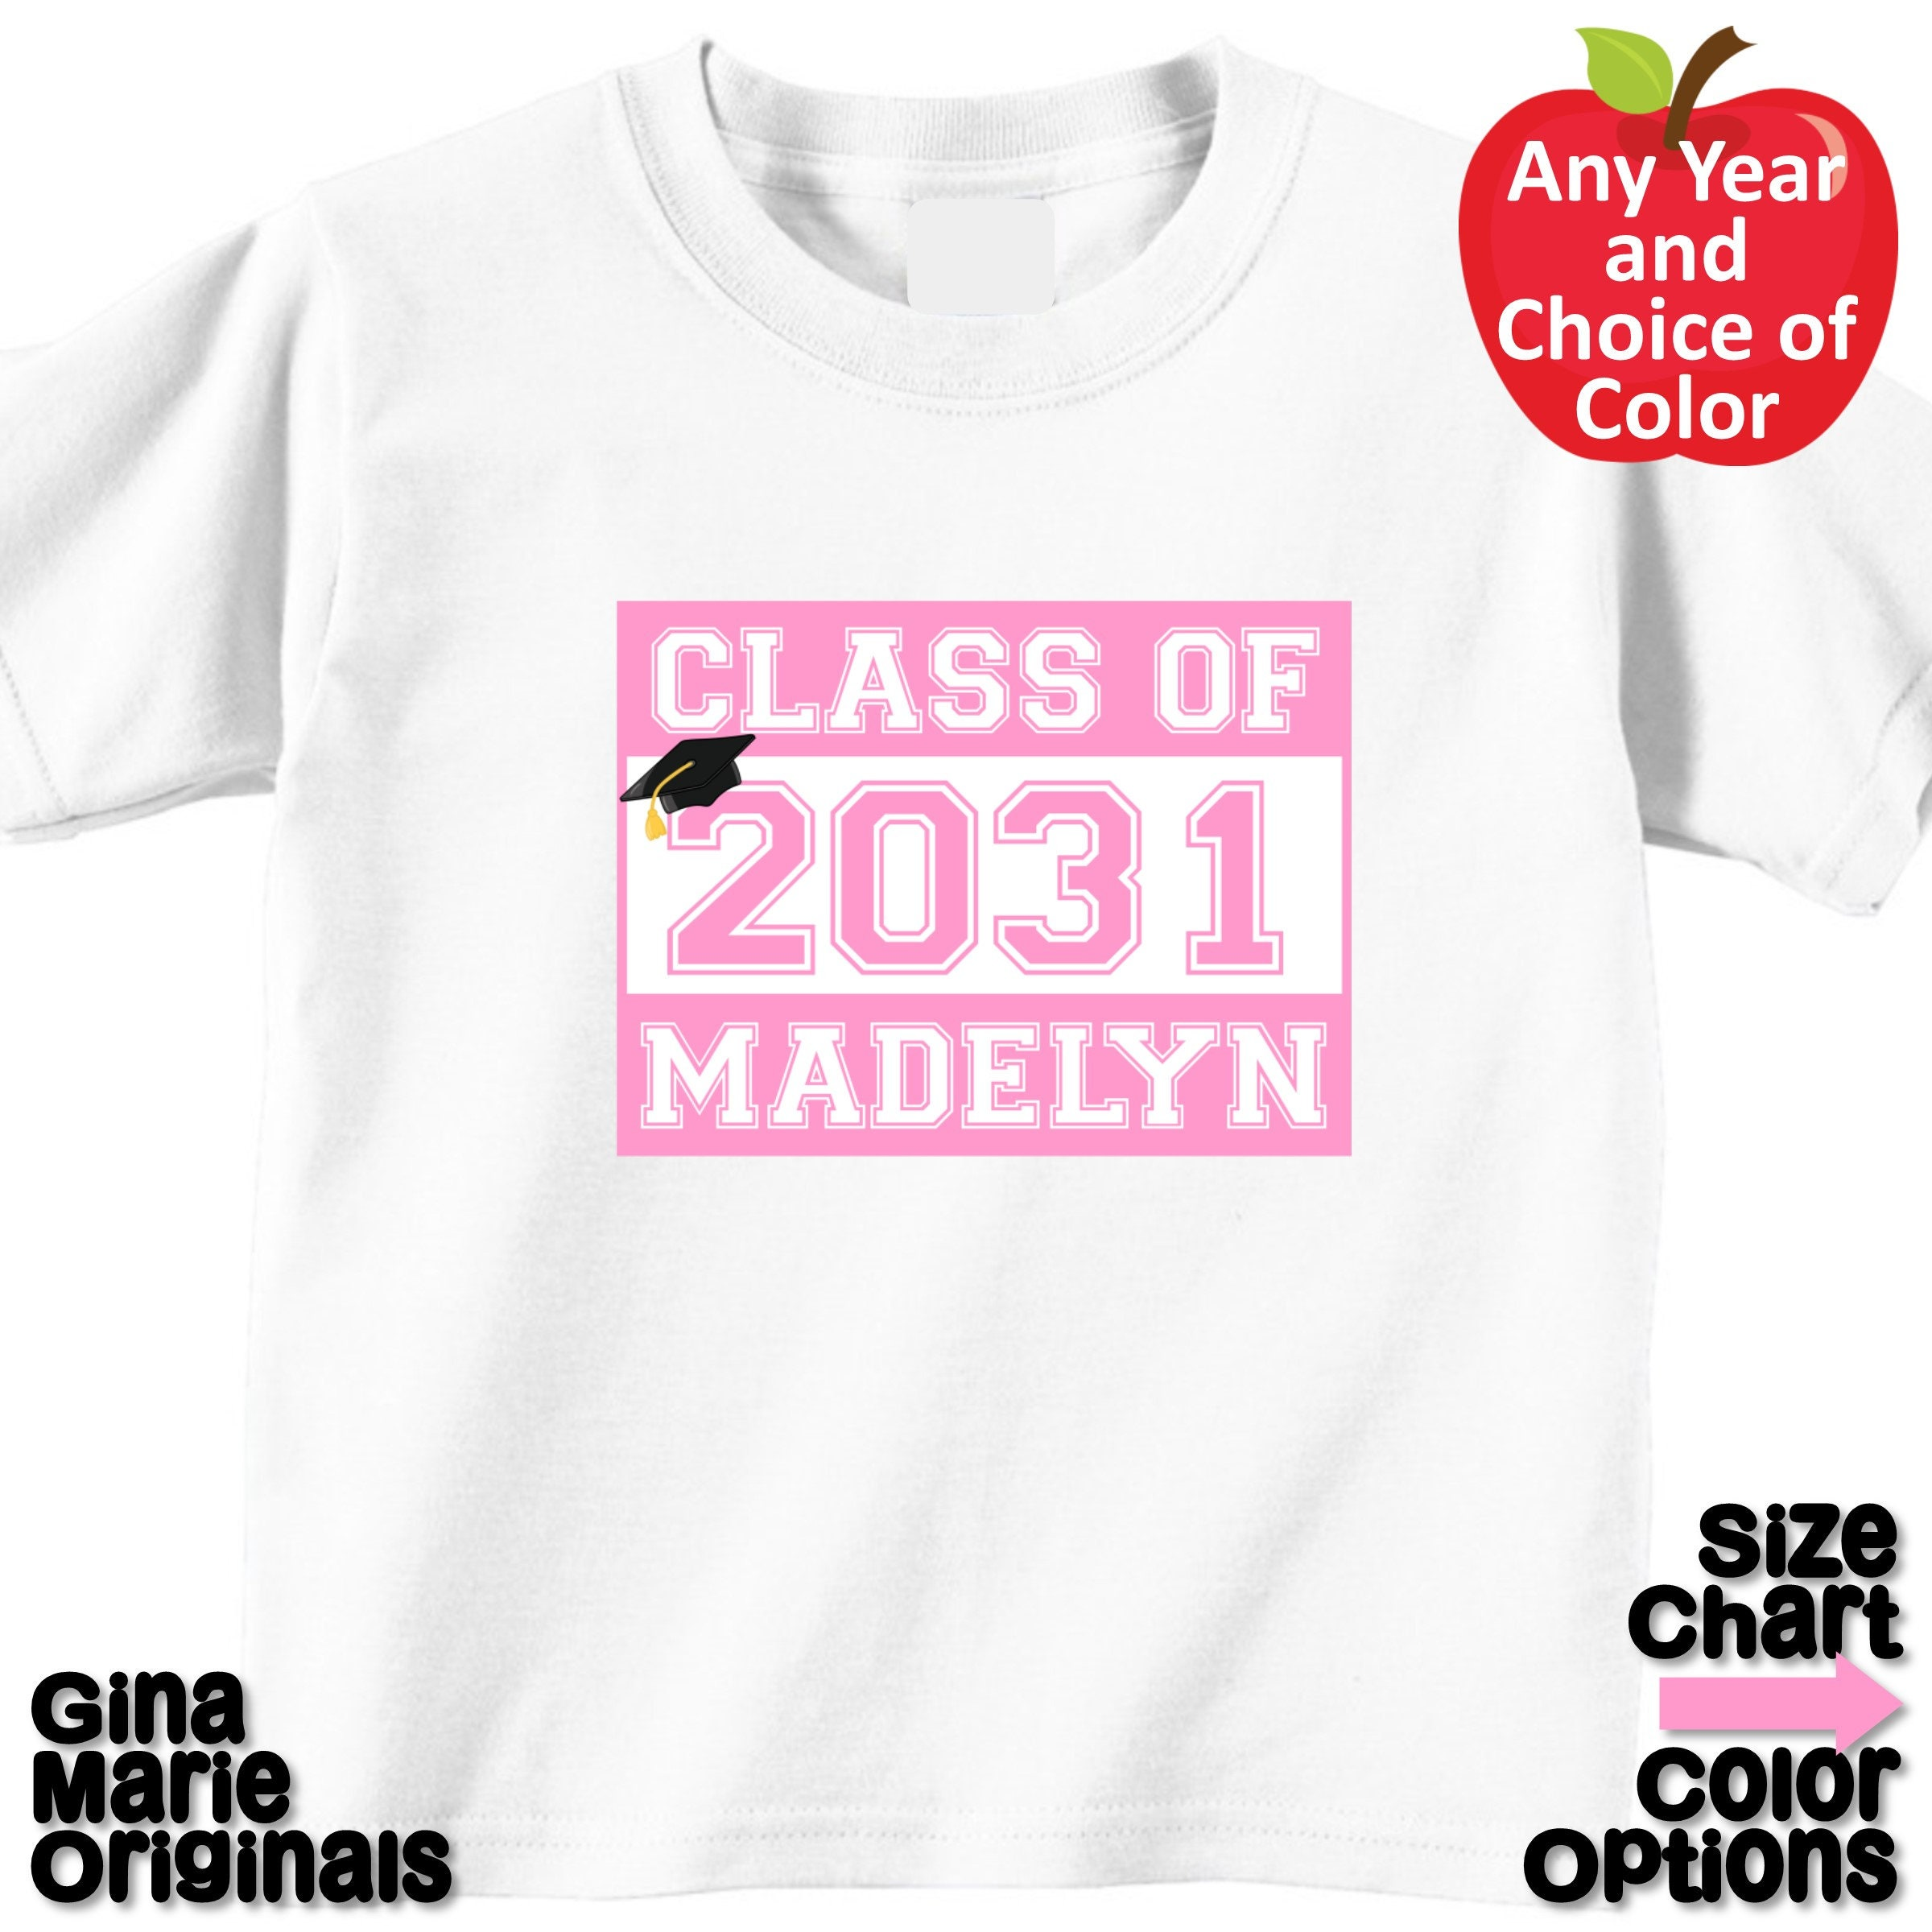 9c8a0cca7cb Personalized High School Graduation Class Shirt T-shirt Boy Girl Kids  Pre-School Pre-K Kindergarten 2031 - Choice of Year and Design Color